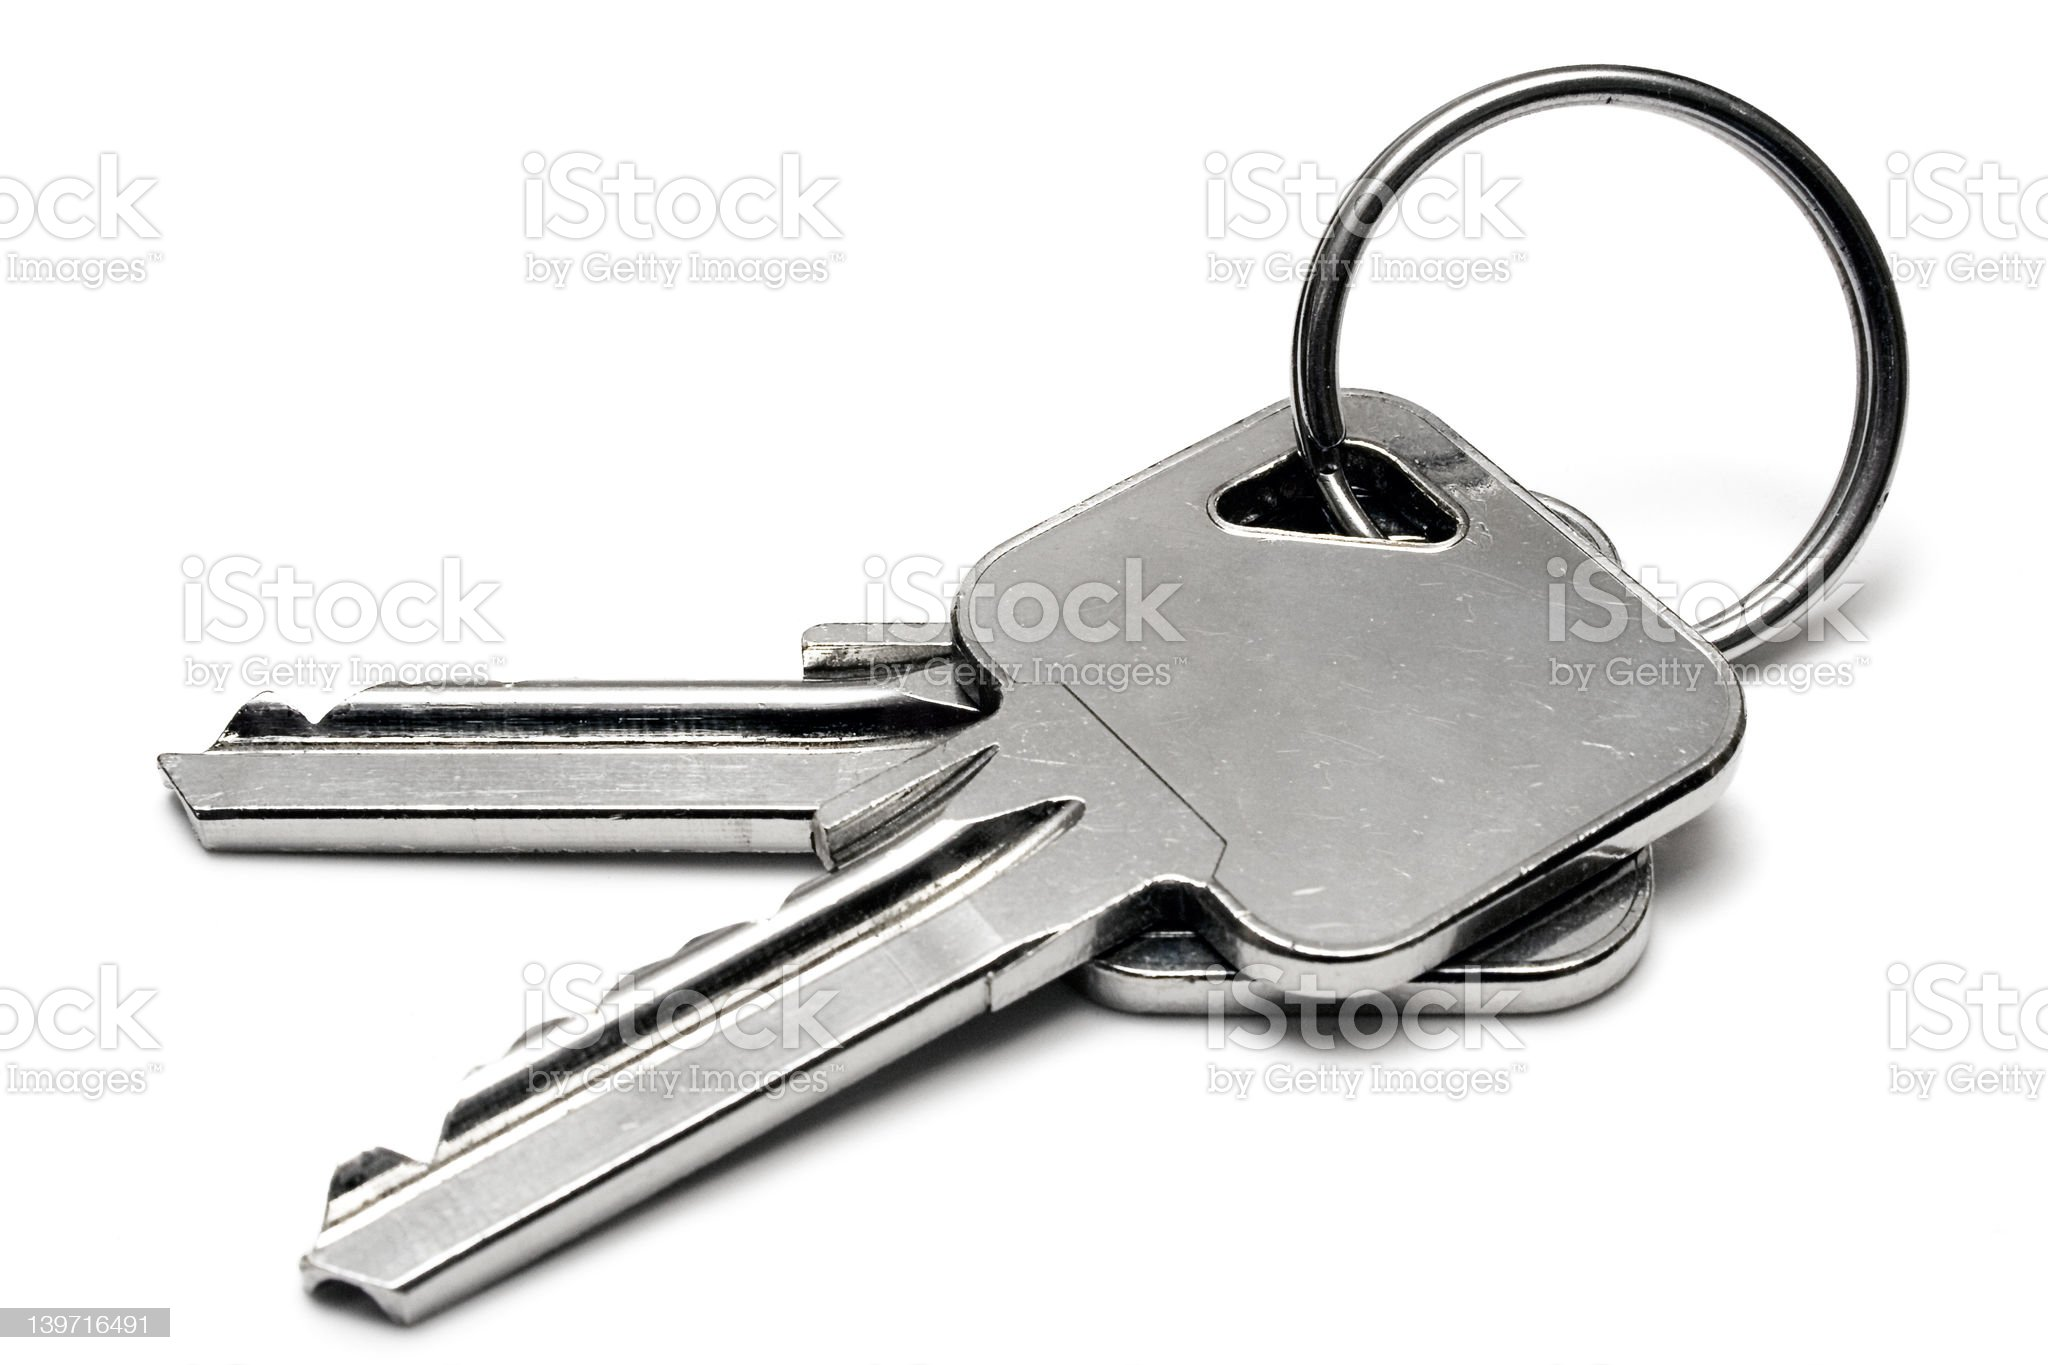 Two Apartment Keys w/ Ring royalty-free stock photo